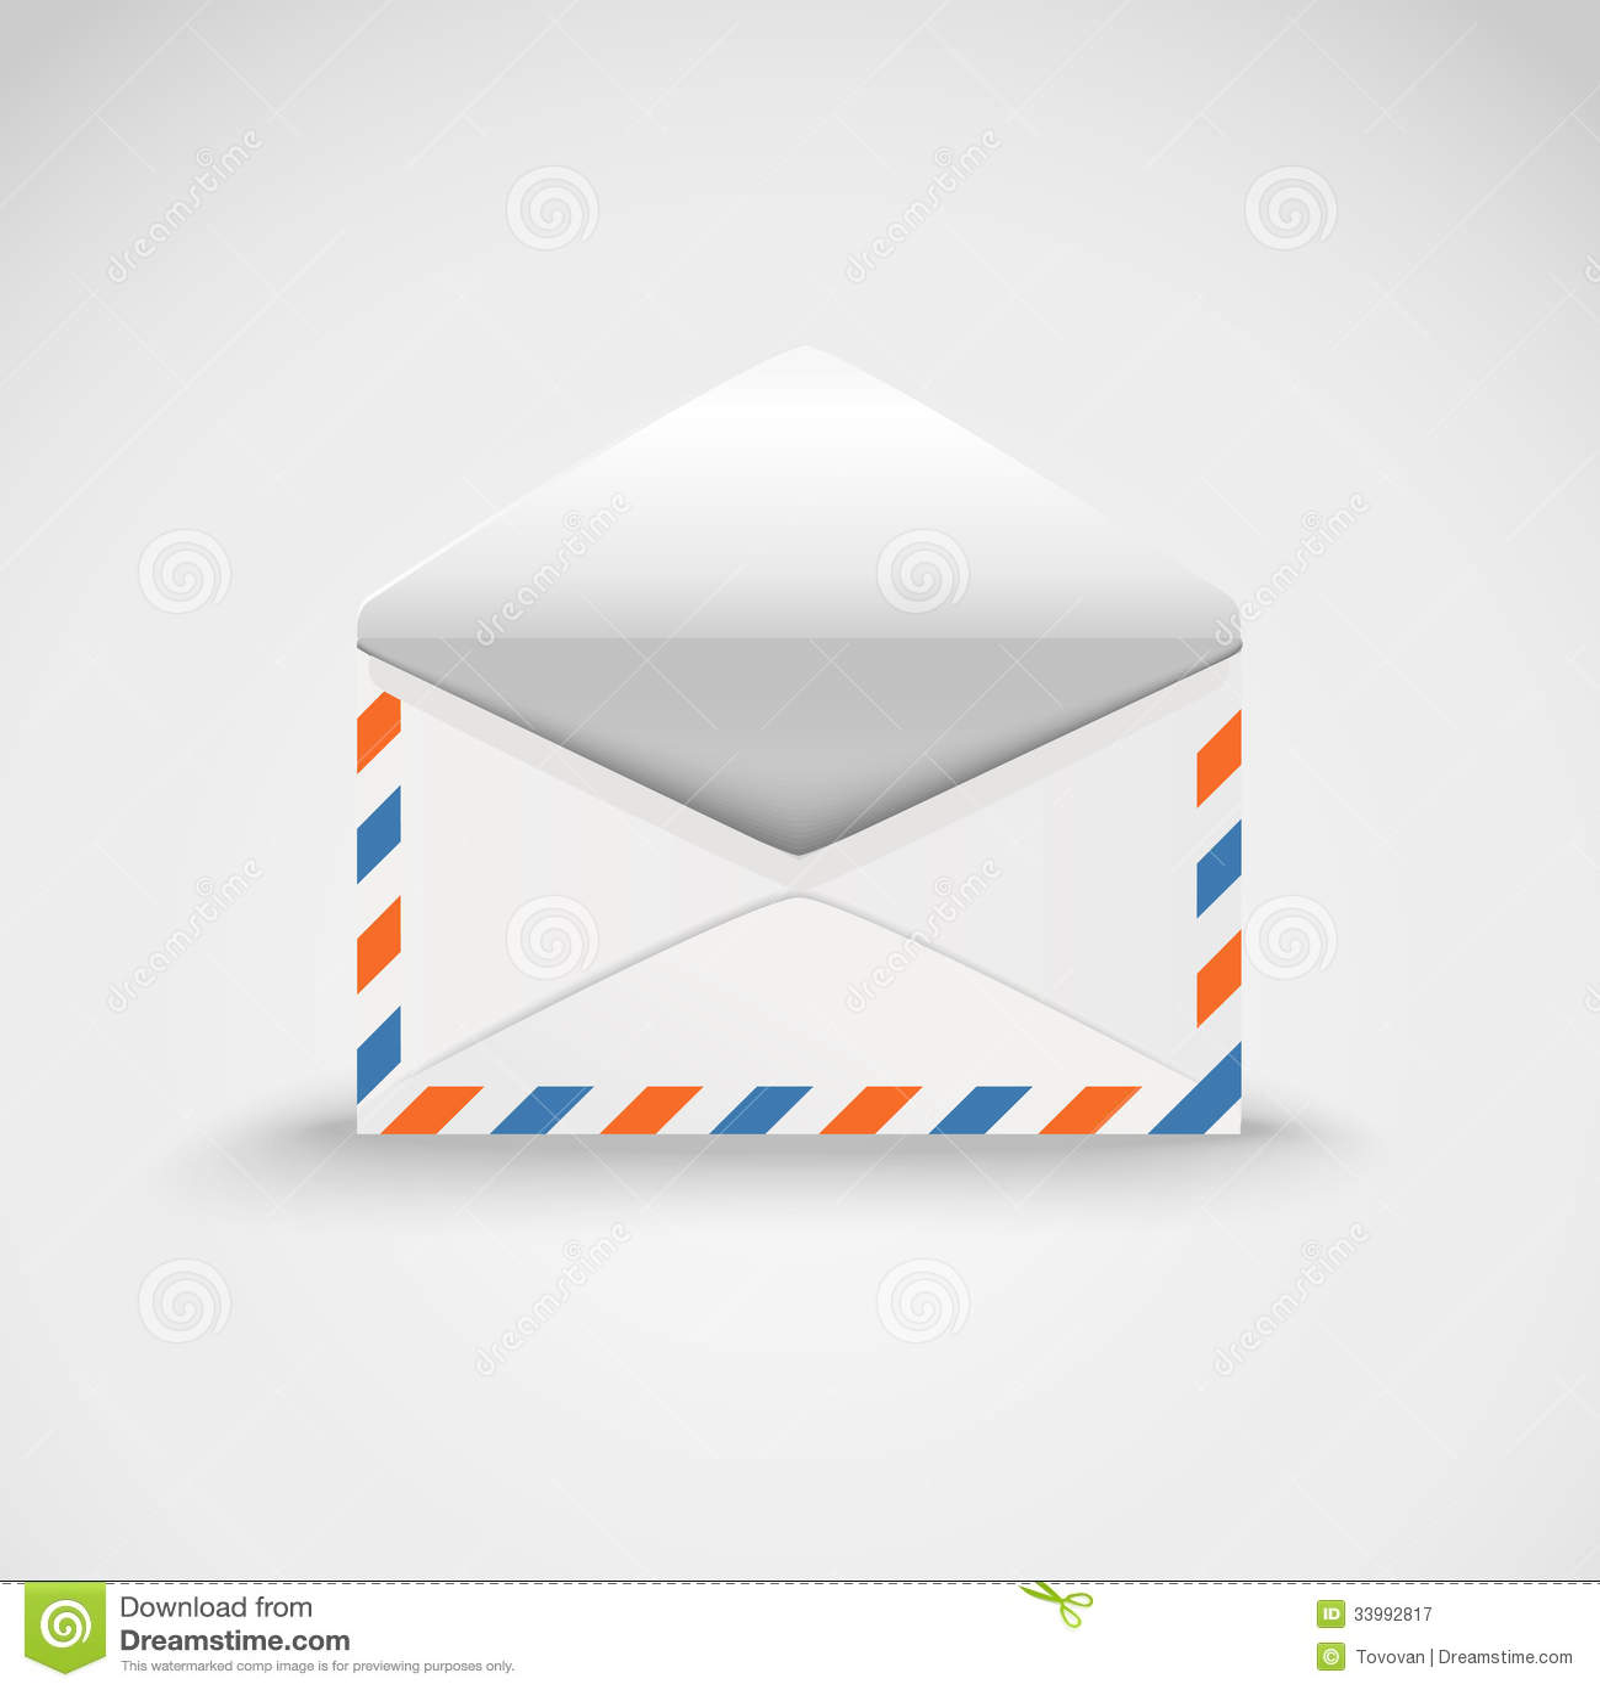 Open White Envelope Royalty Free Stock Photography - Image: 33992817